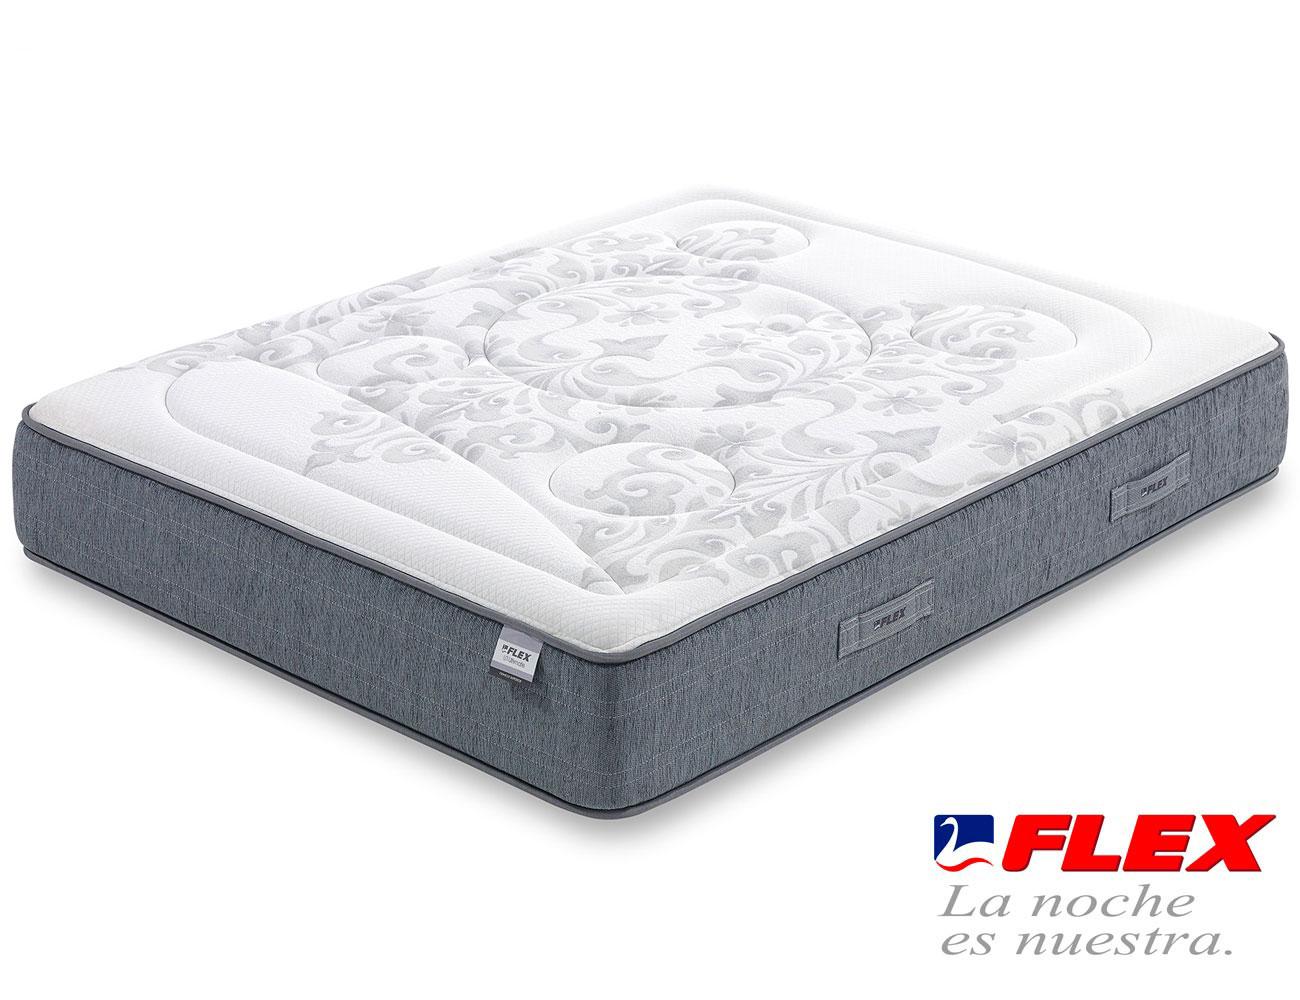 Colchon flex airvex viscoelastica gel garbi superior10